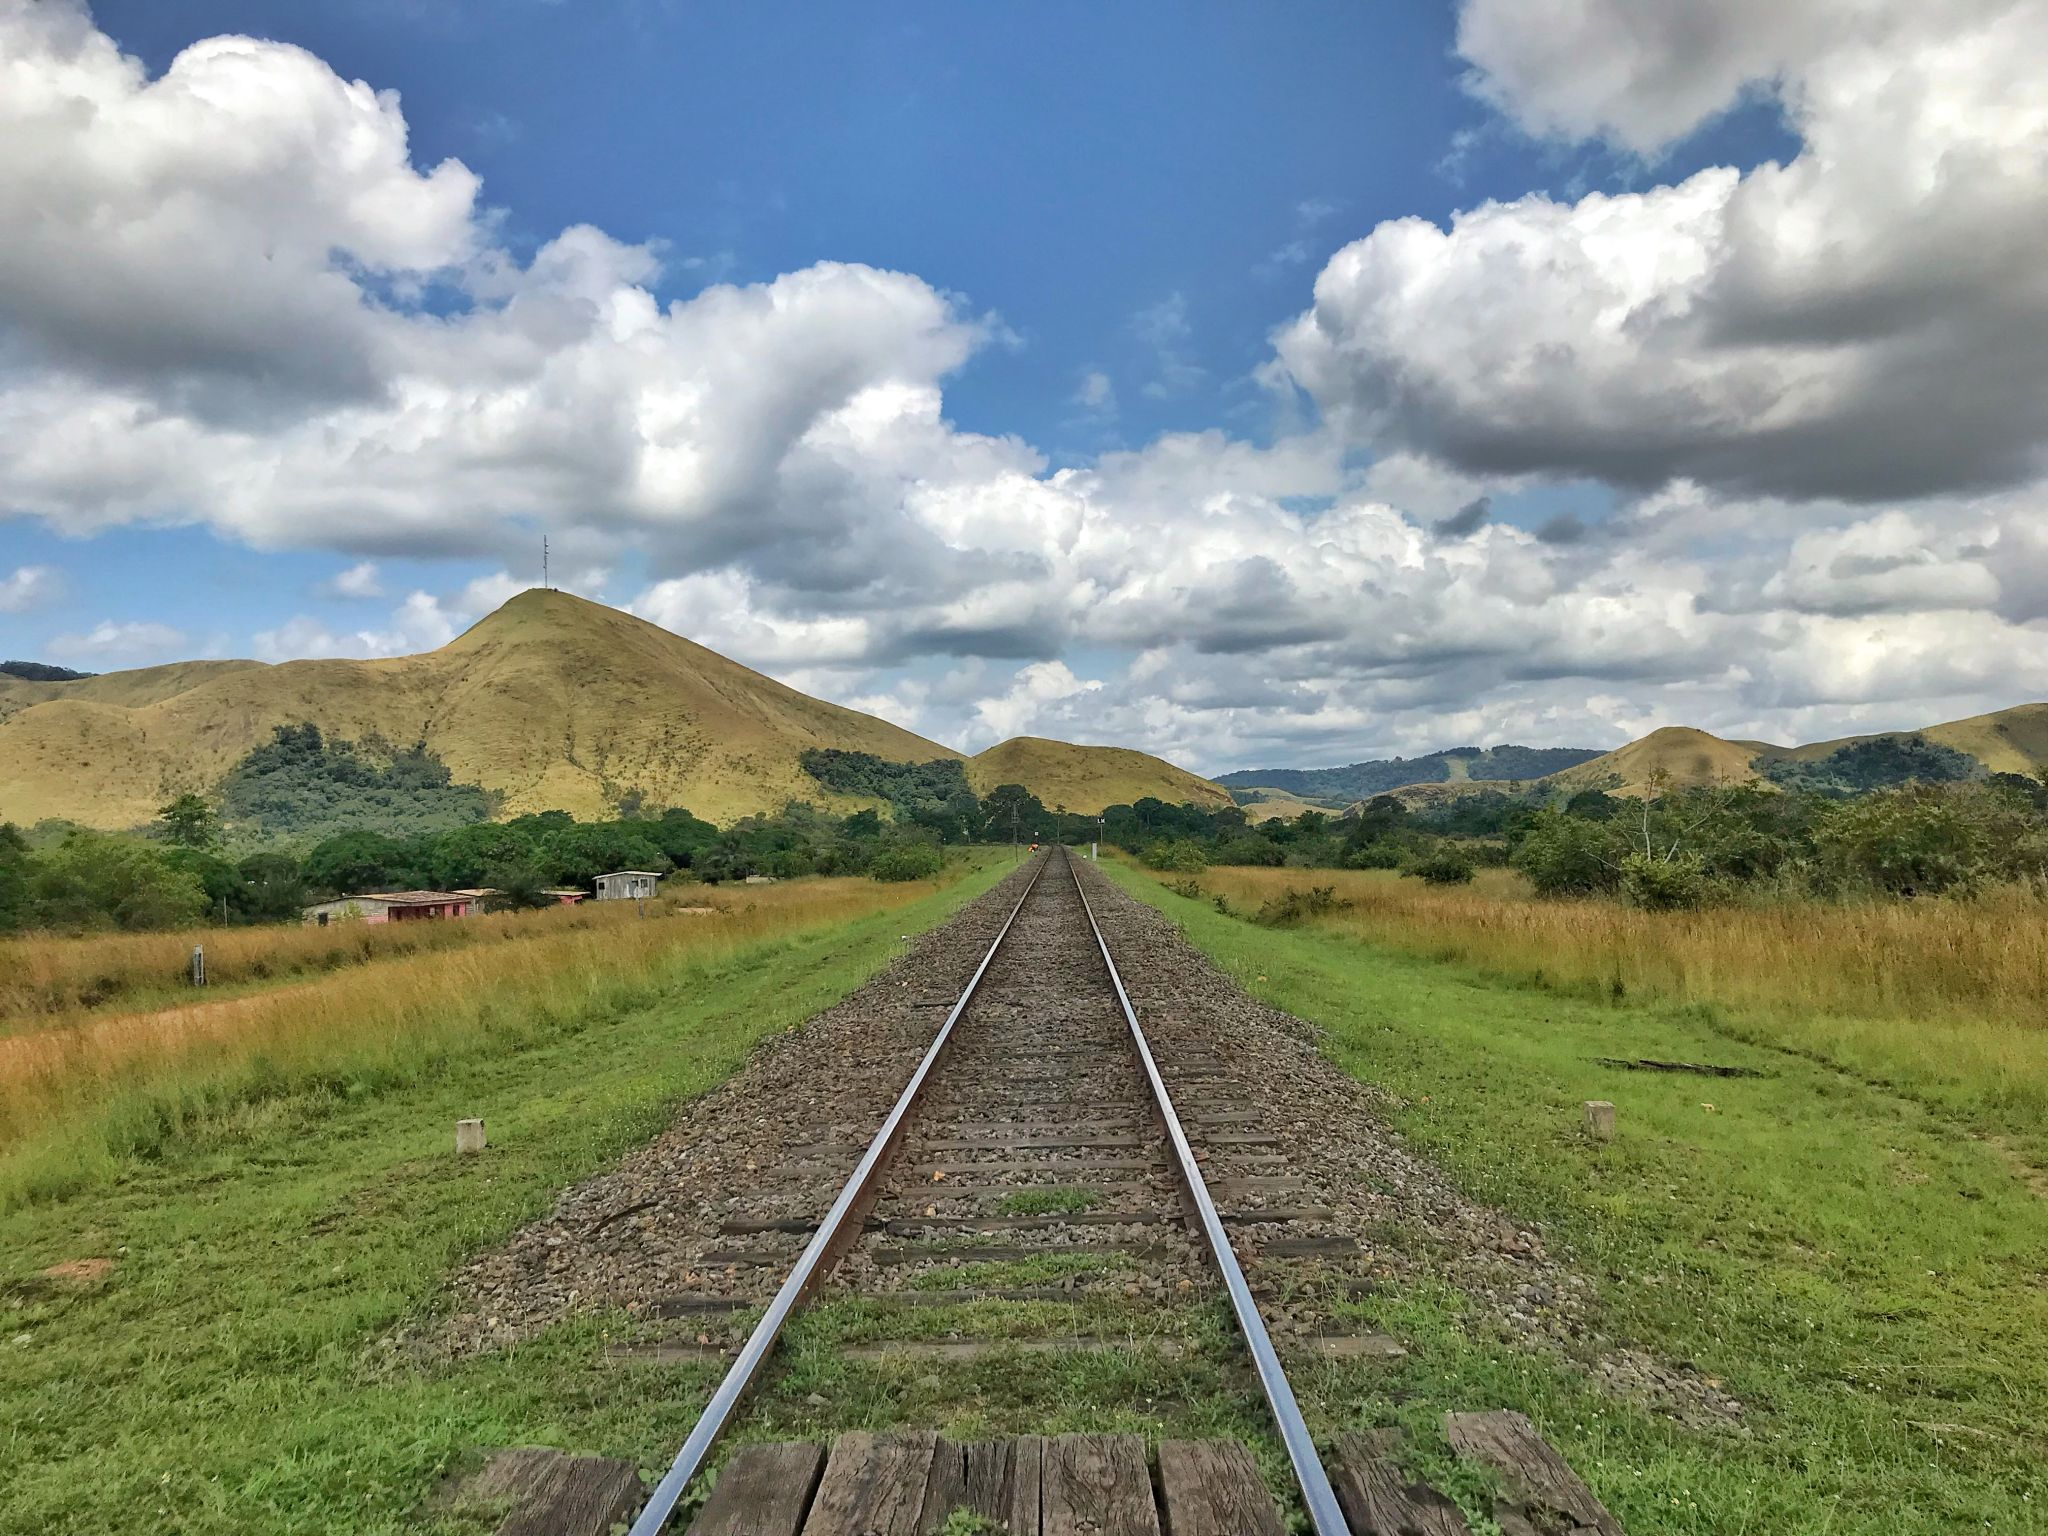 Trans Gabon Railway - Lope Station Track View